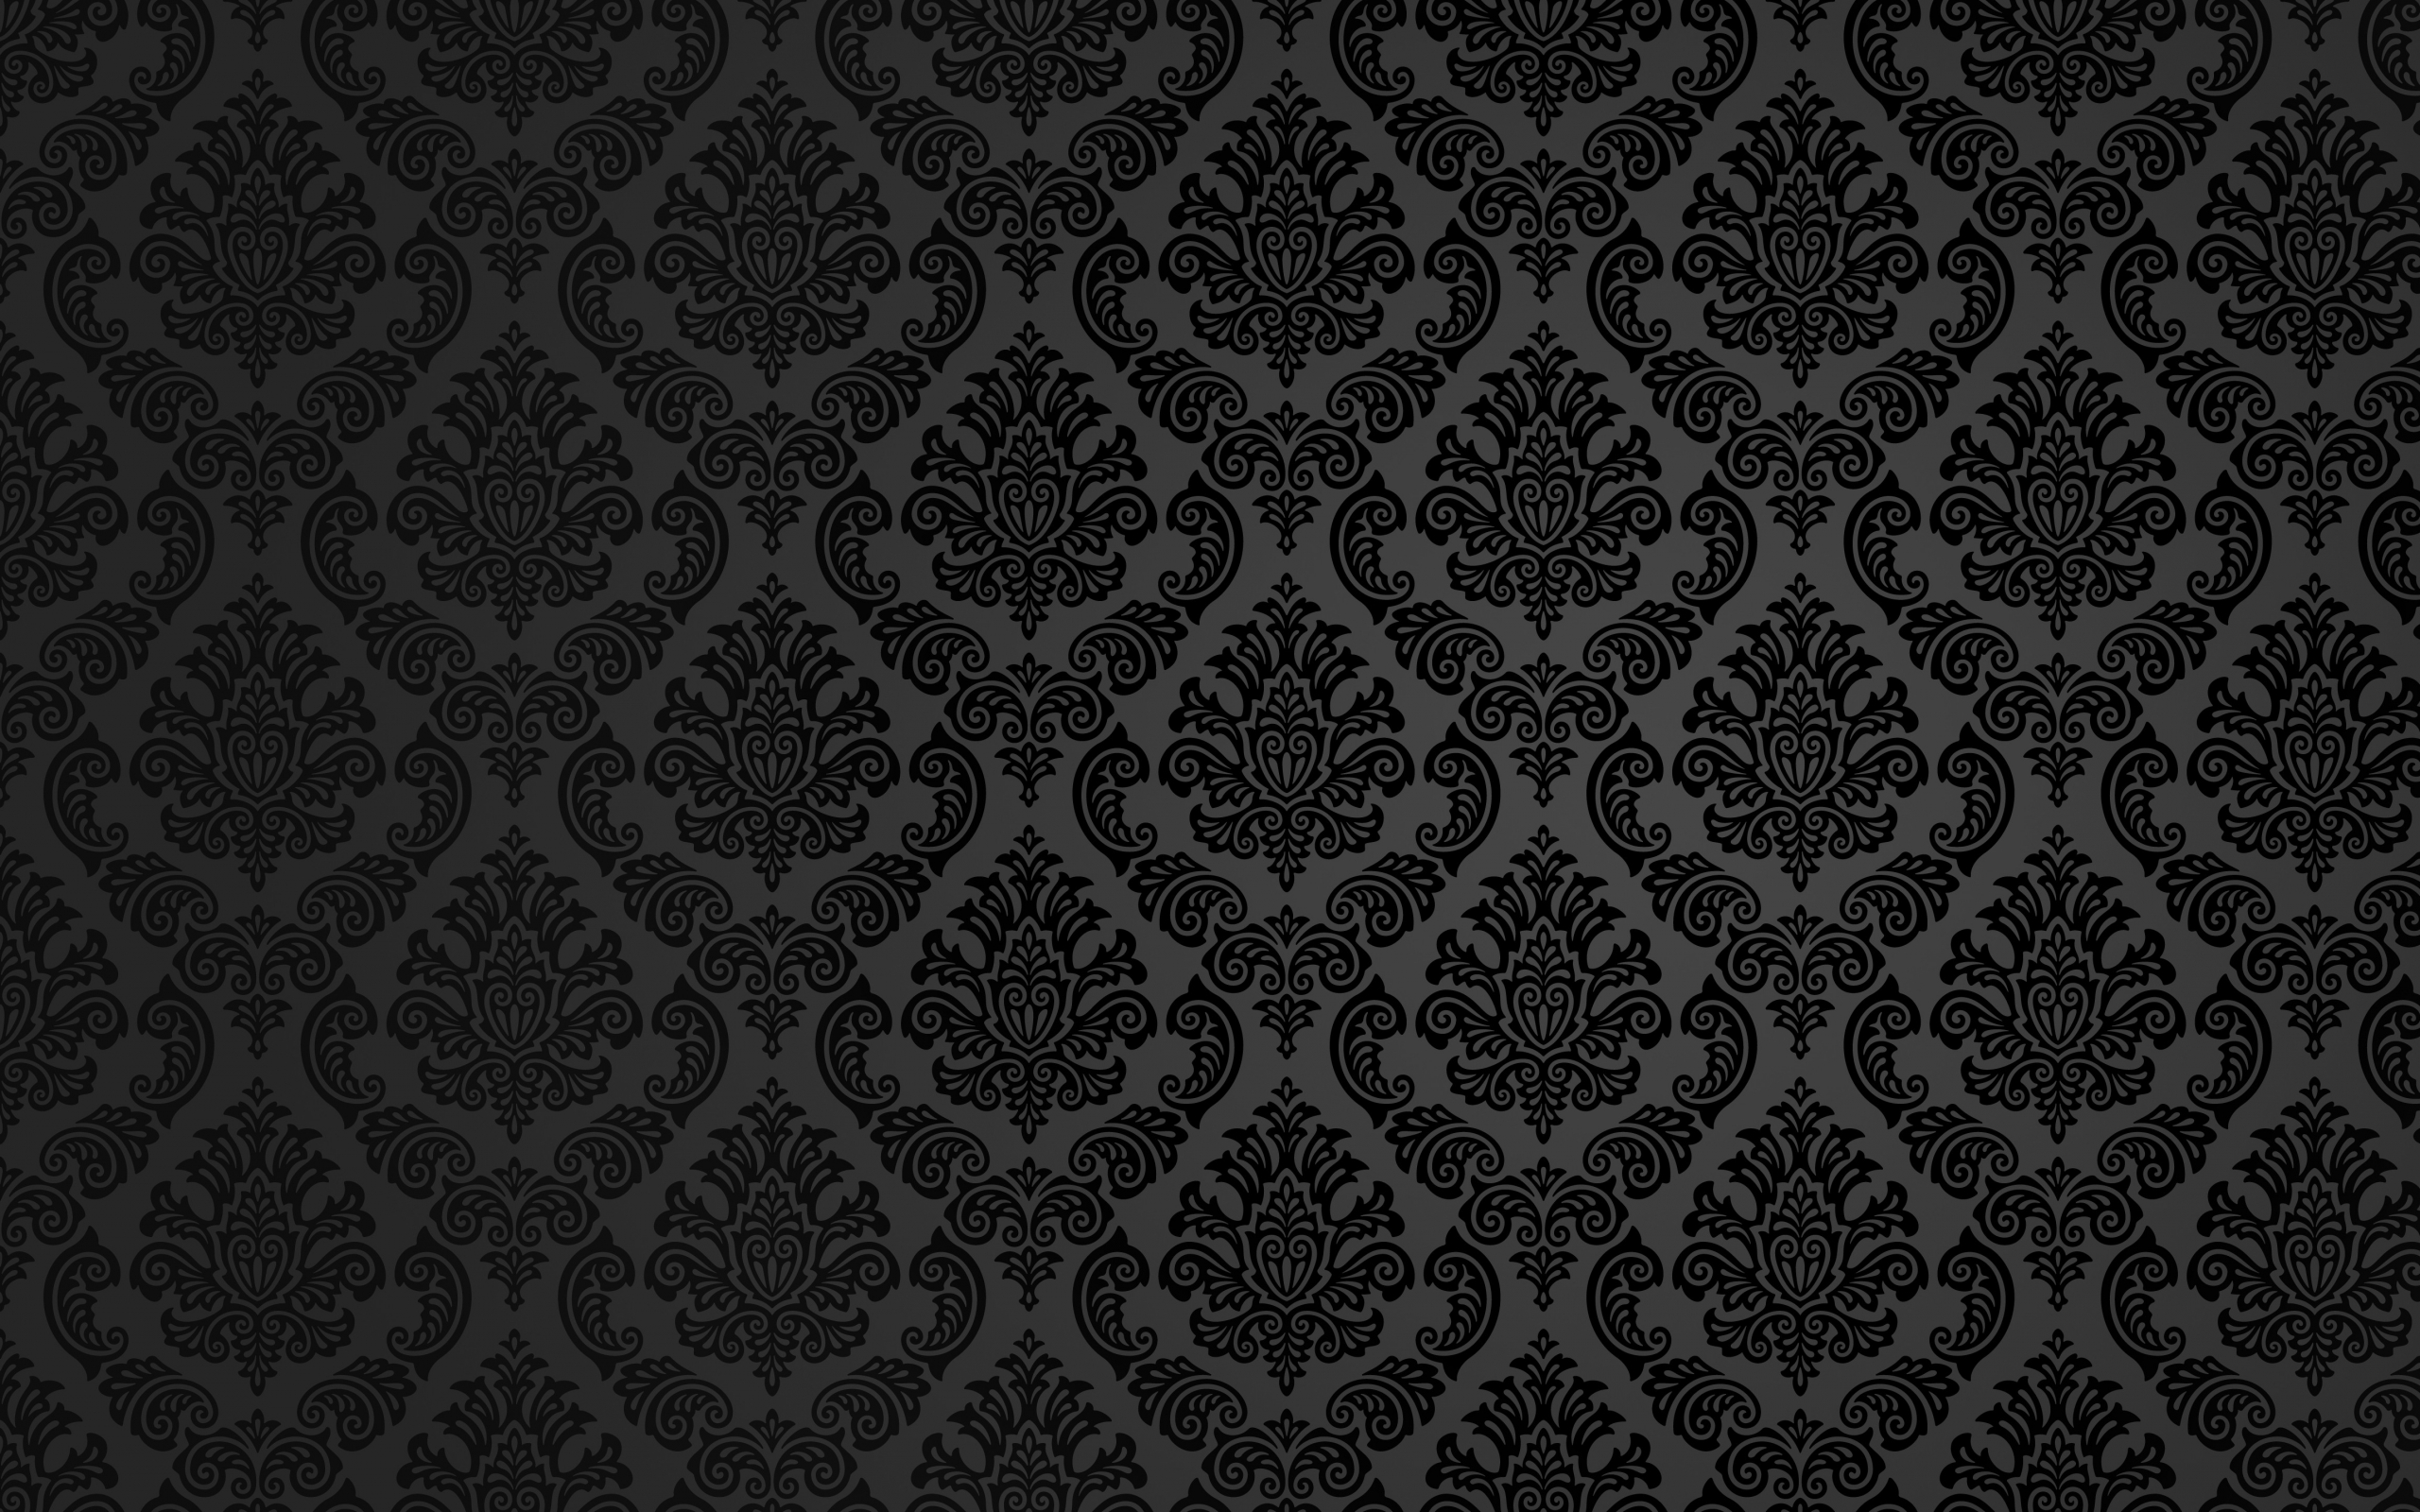 Download wallpapers download 25601600 patterns damask 63002893 2560x1600